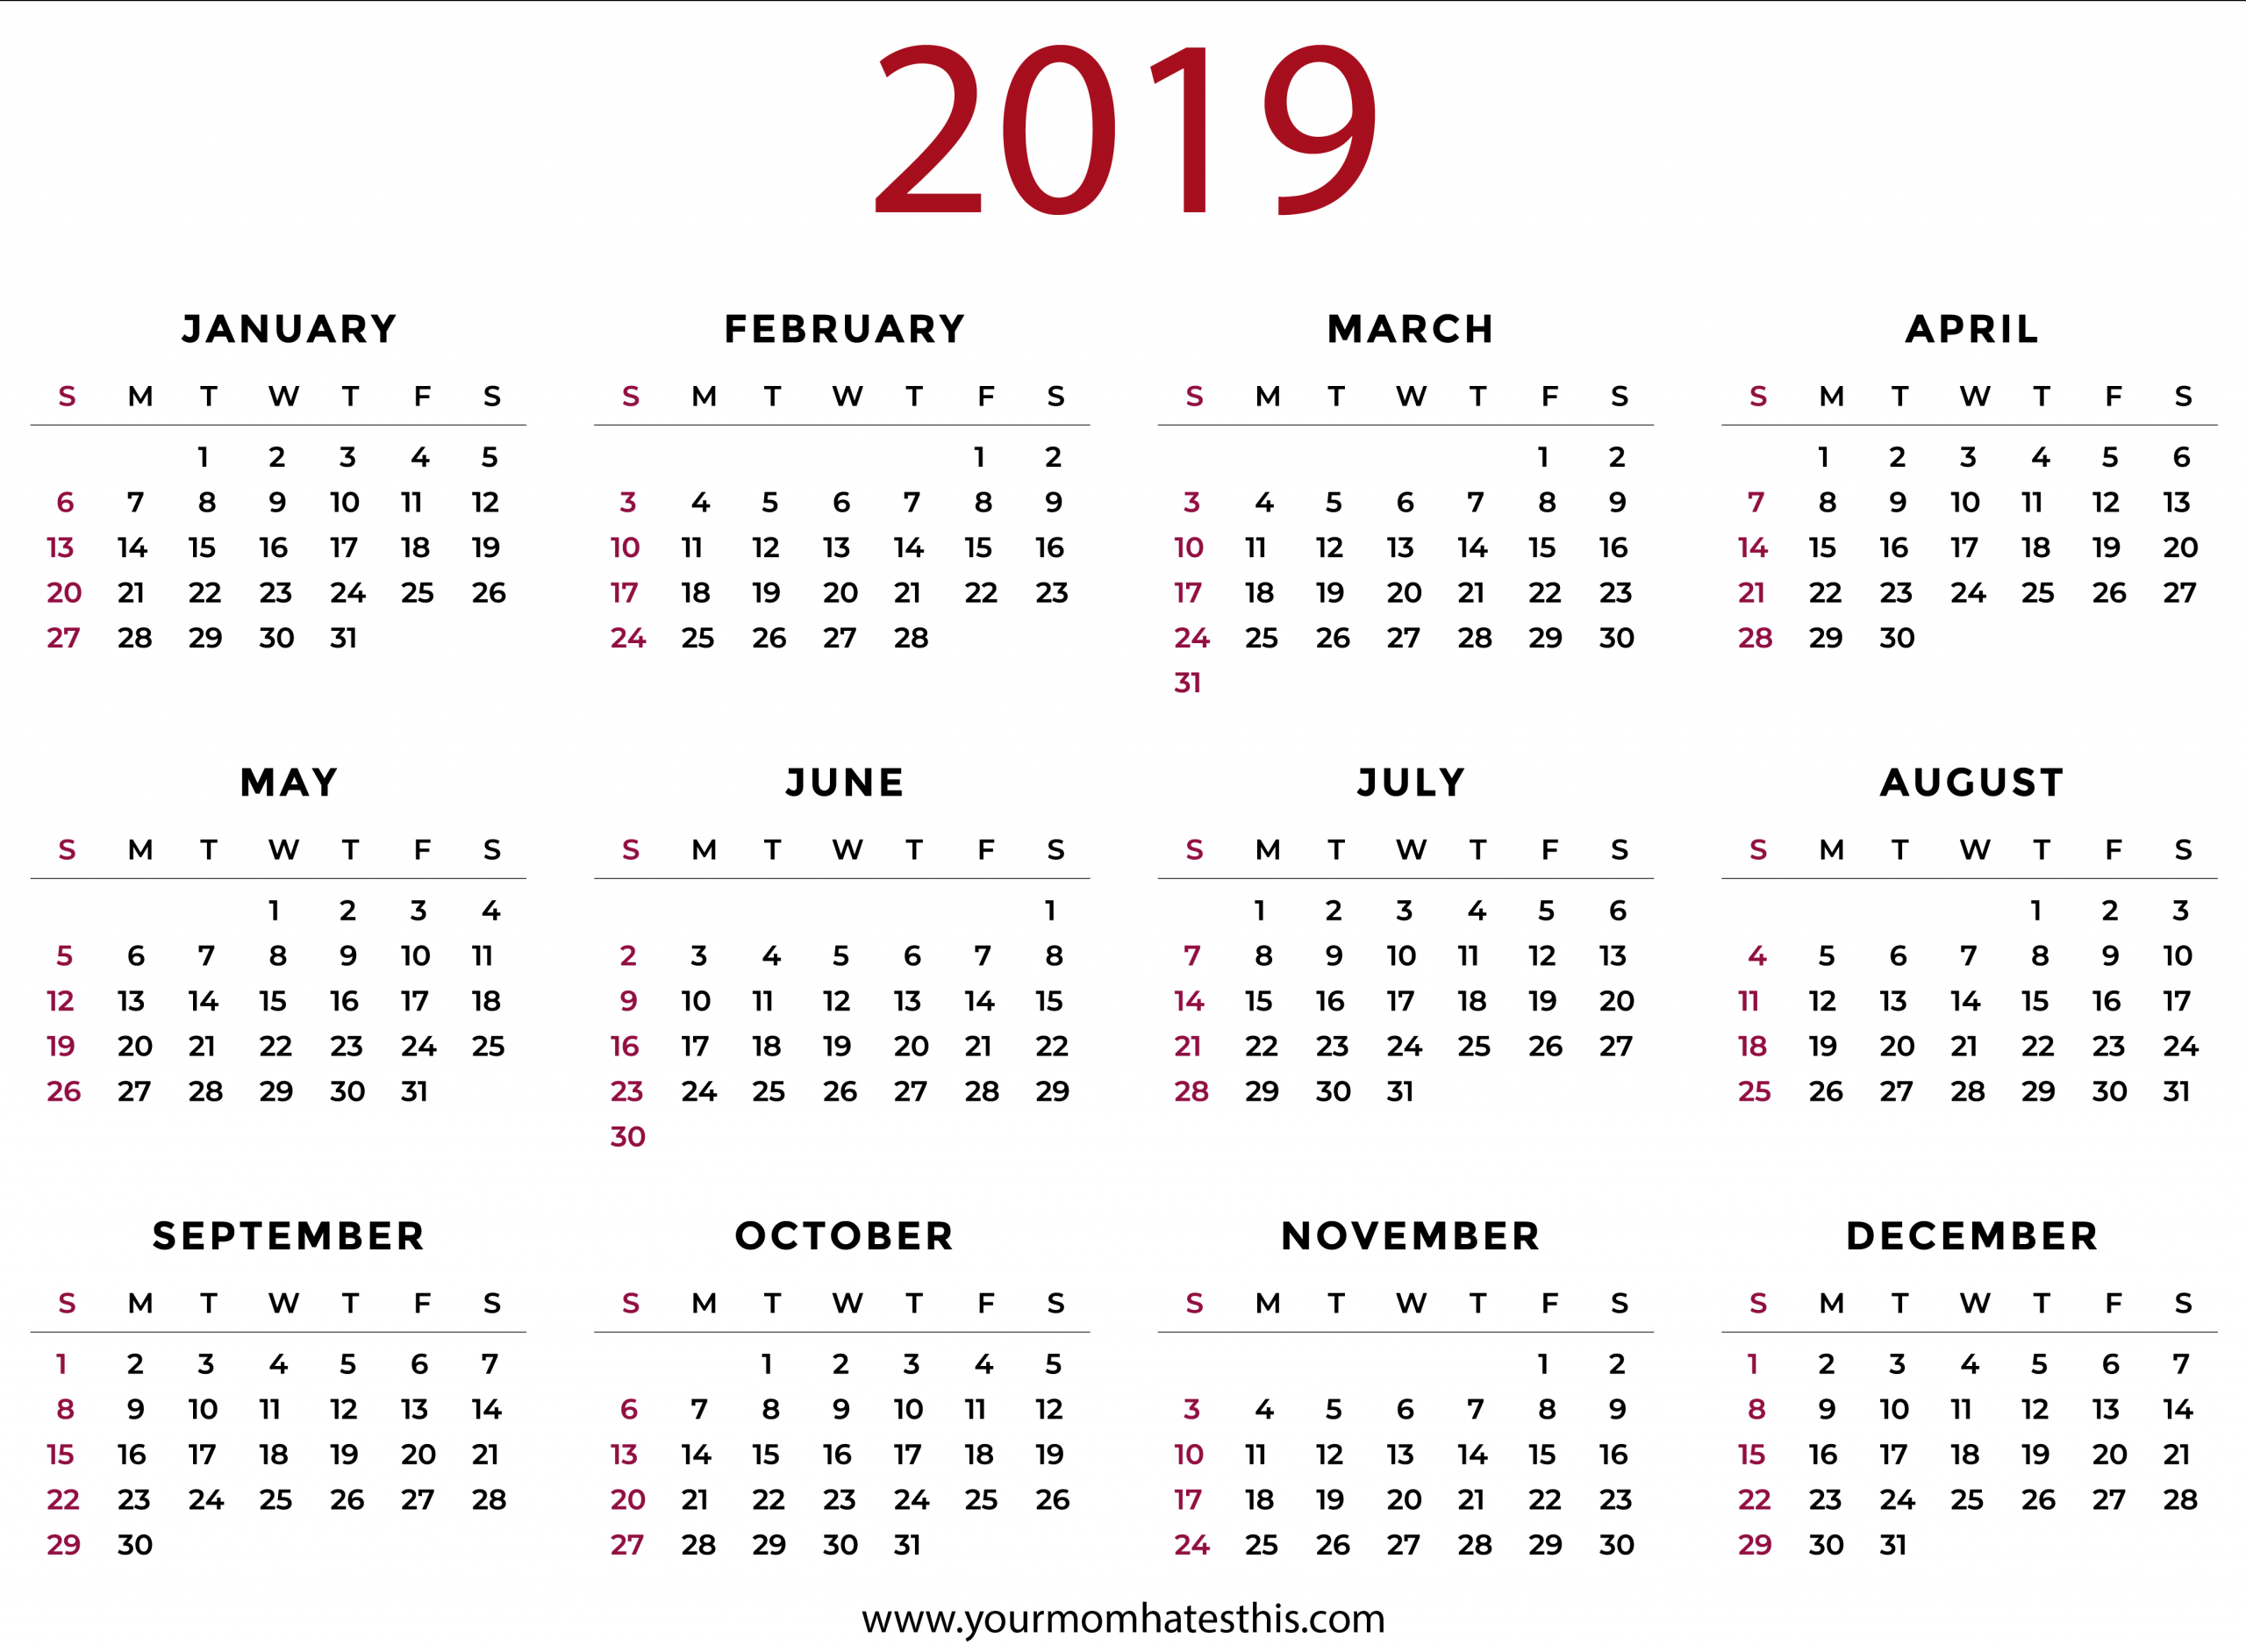 2019 Calendars Download Pdf Templates Image Of Month Calendar